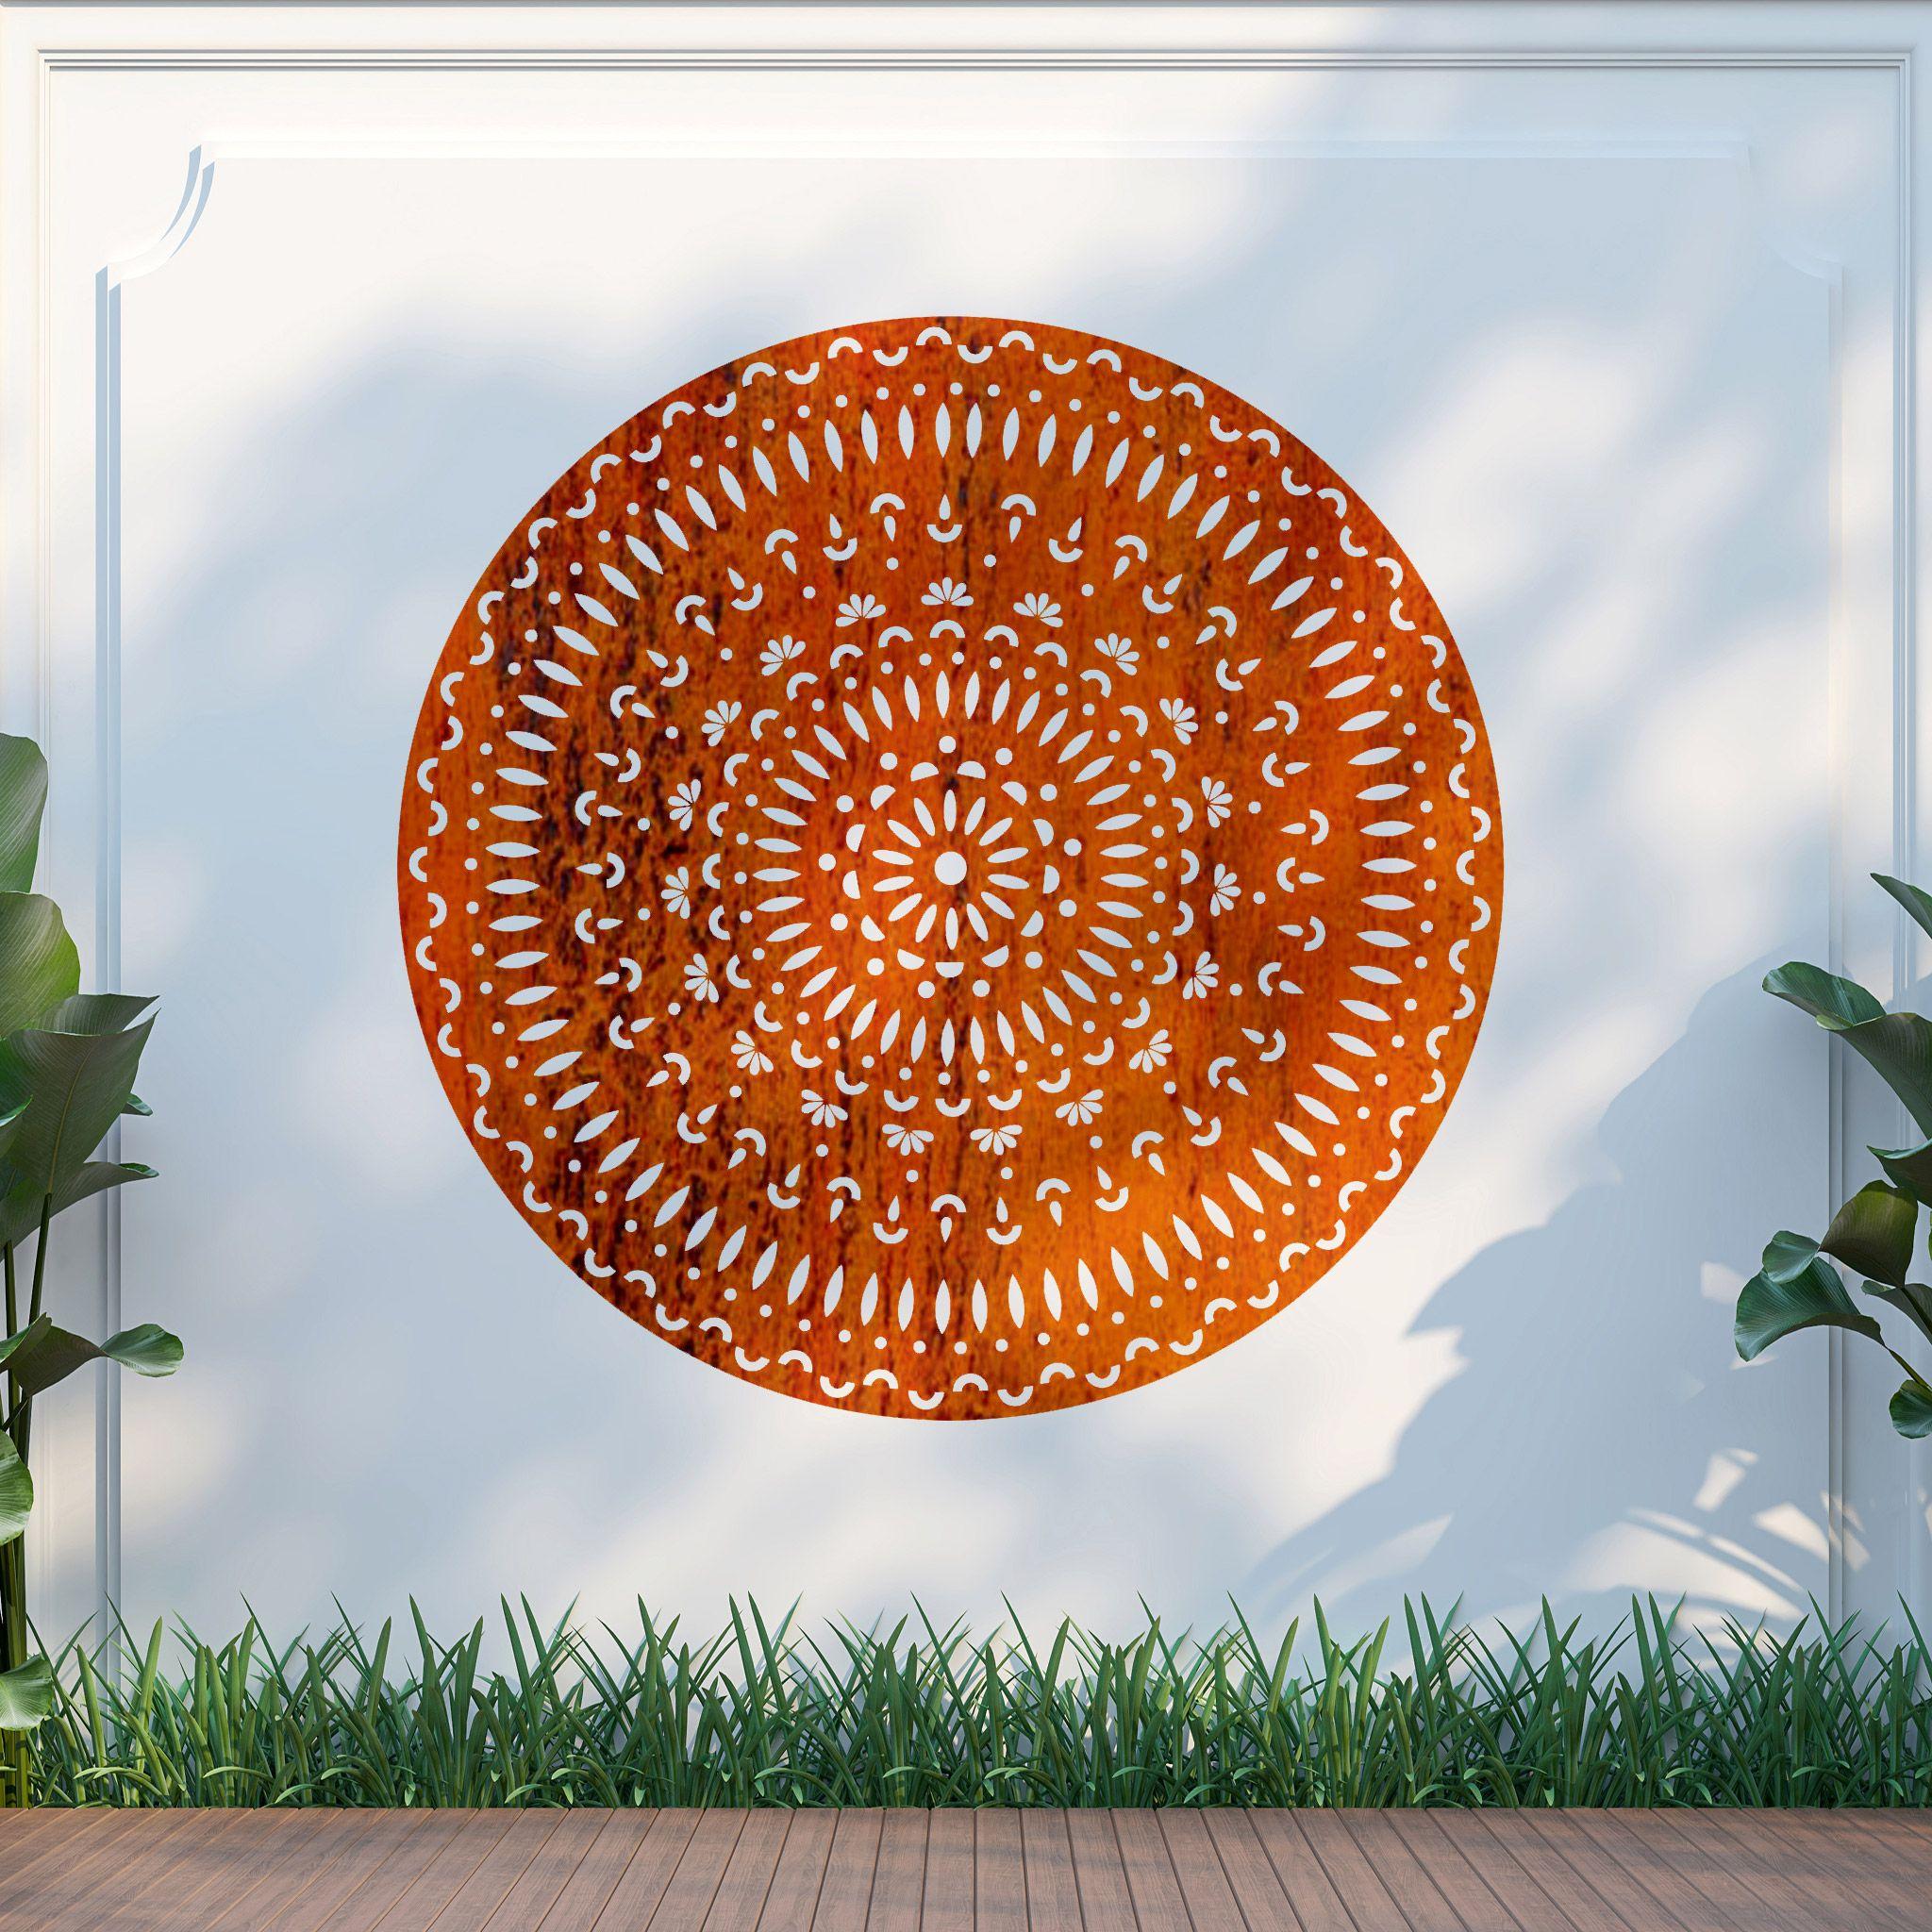 Mandala metal-garden-art-fence-wall